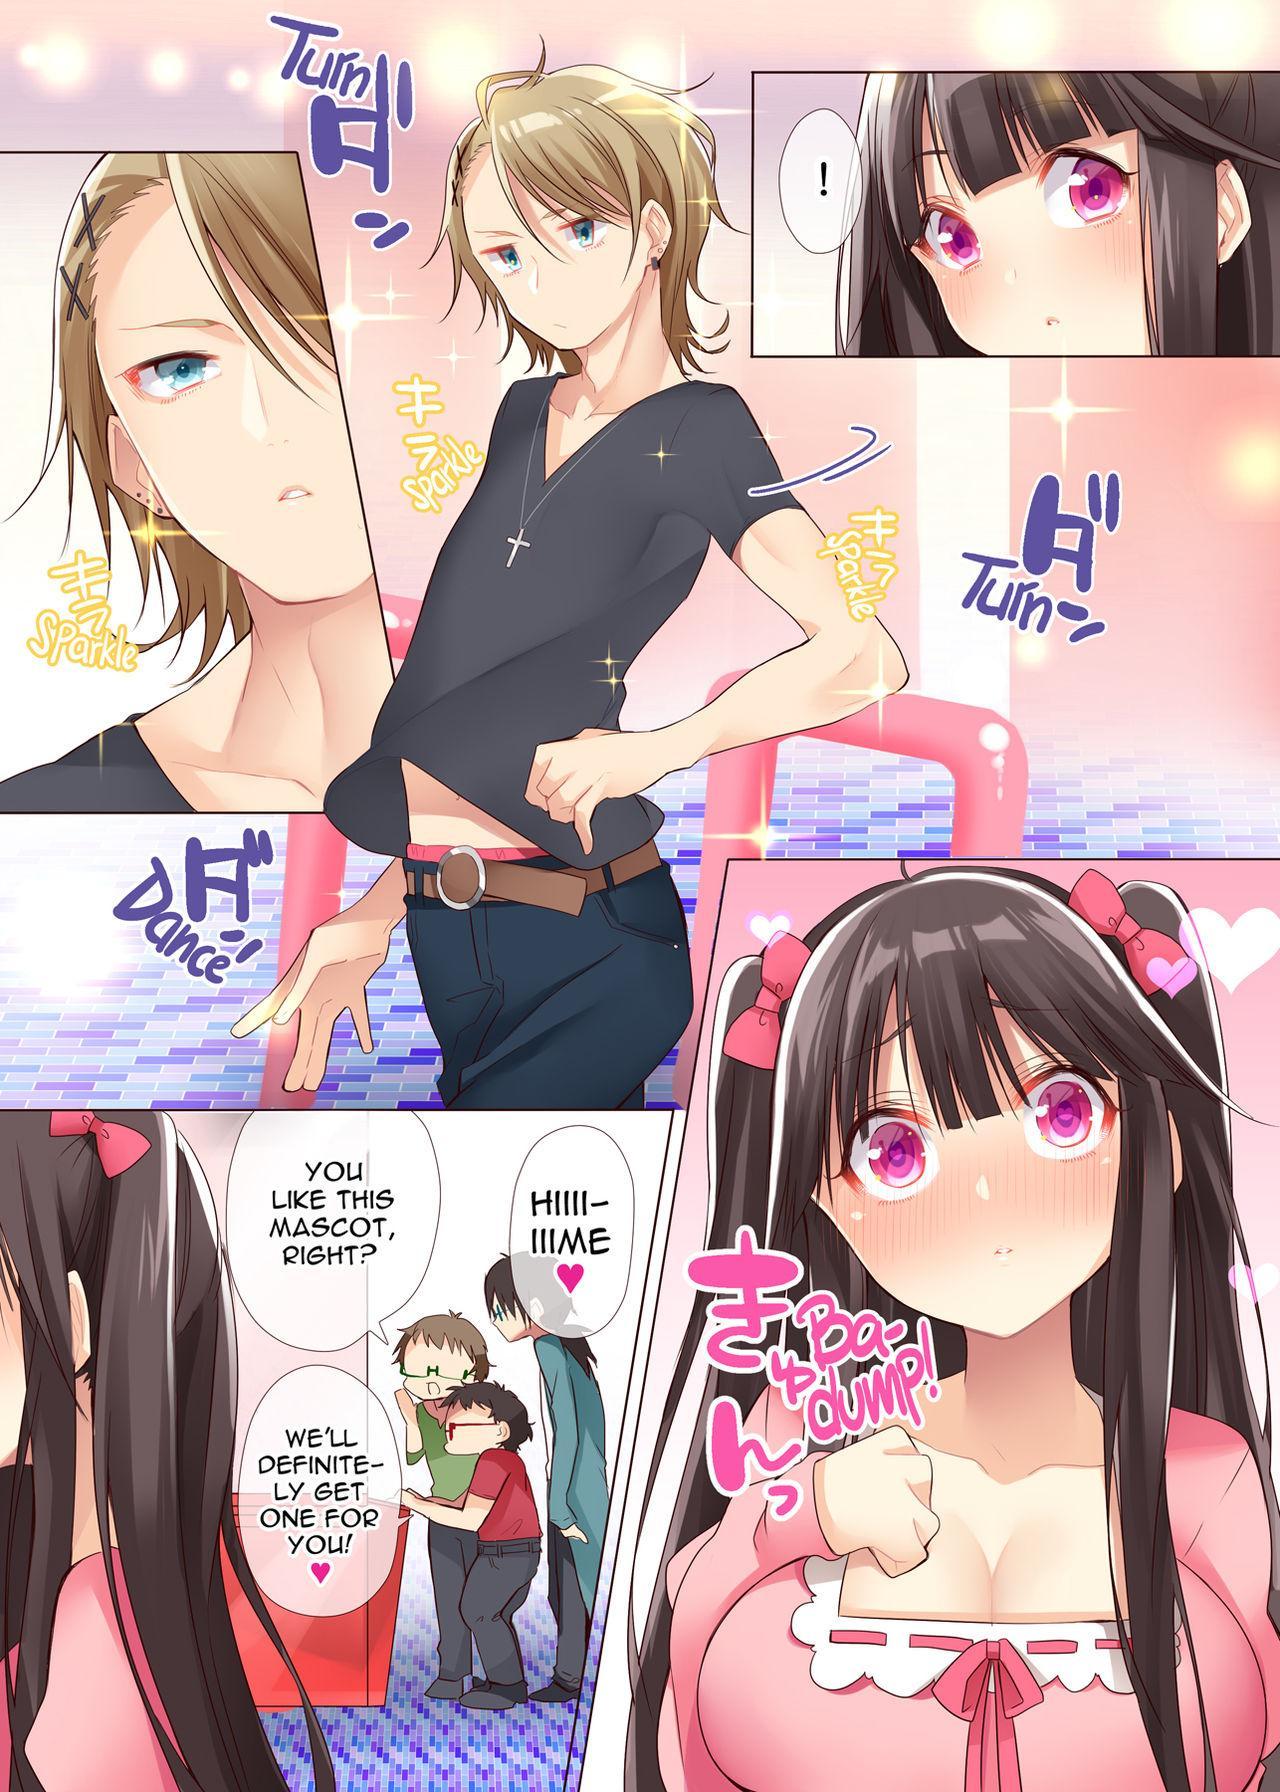 The Princess of an Otaku Group Got Knocked Up by Some Piece of Trash So She Let an Otaku Guy Do Her Too!? 2